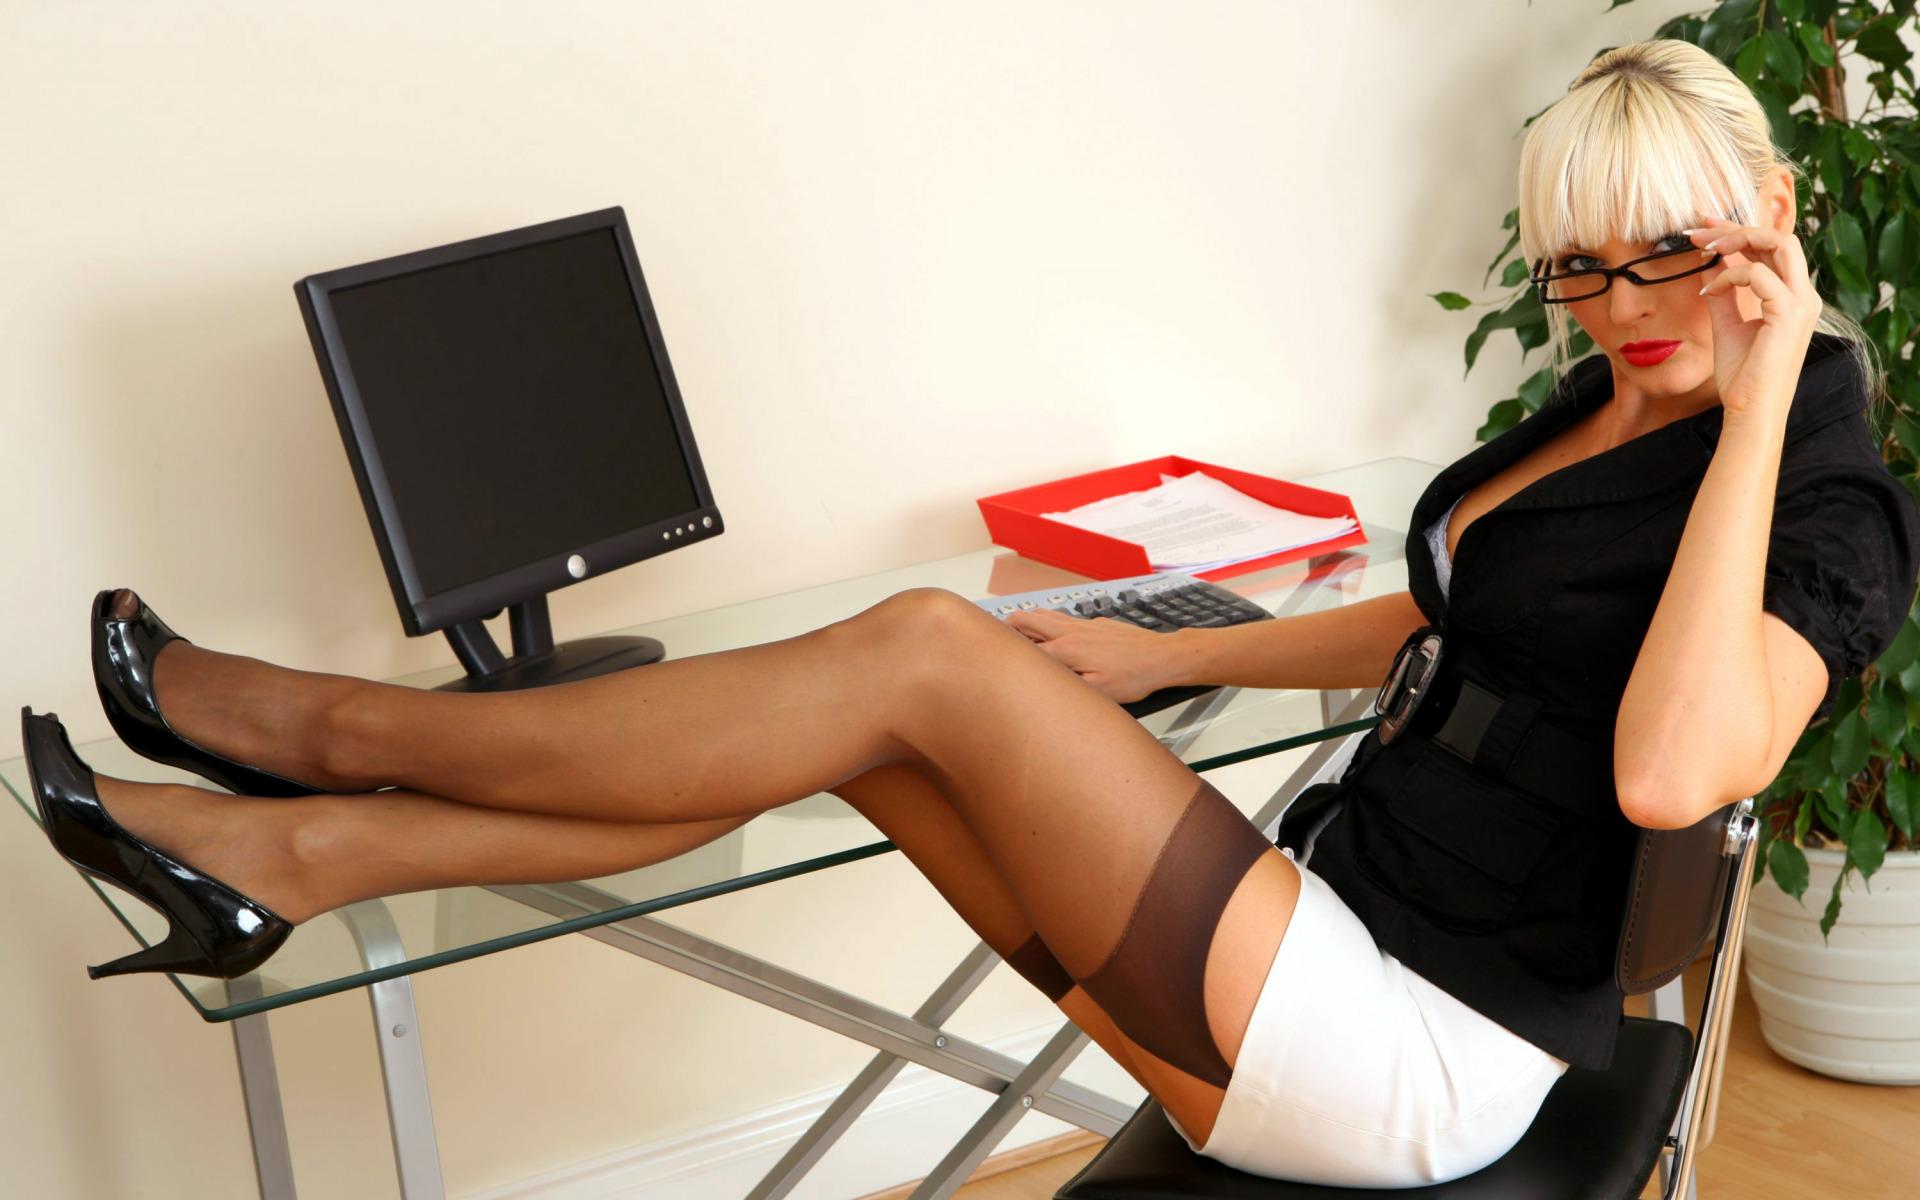 Фото на работе под столом, Девушка в чулках мастурбирует на работе под столом 12 фотография